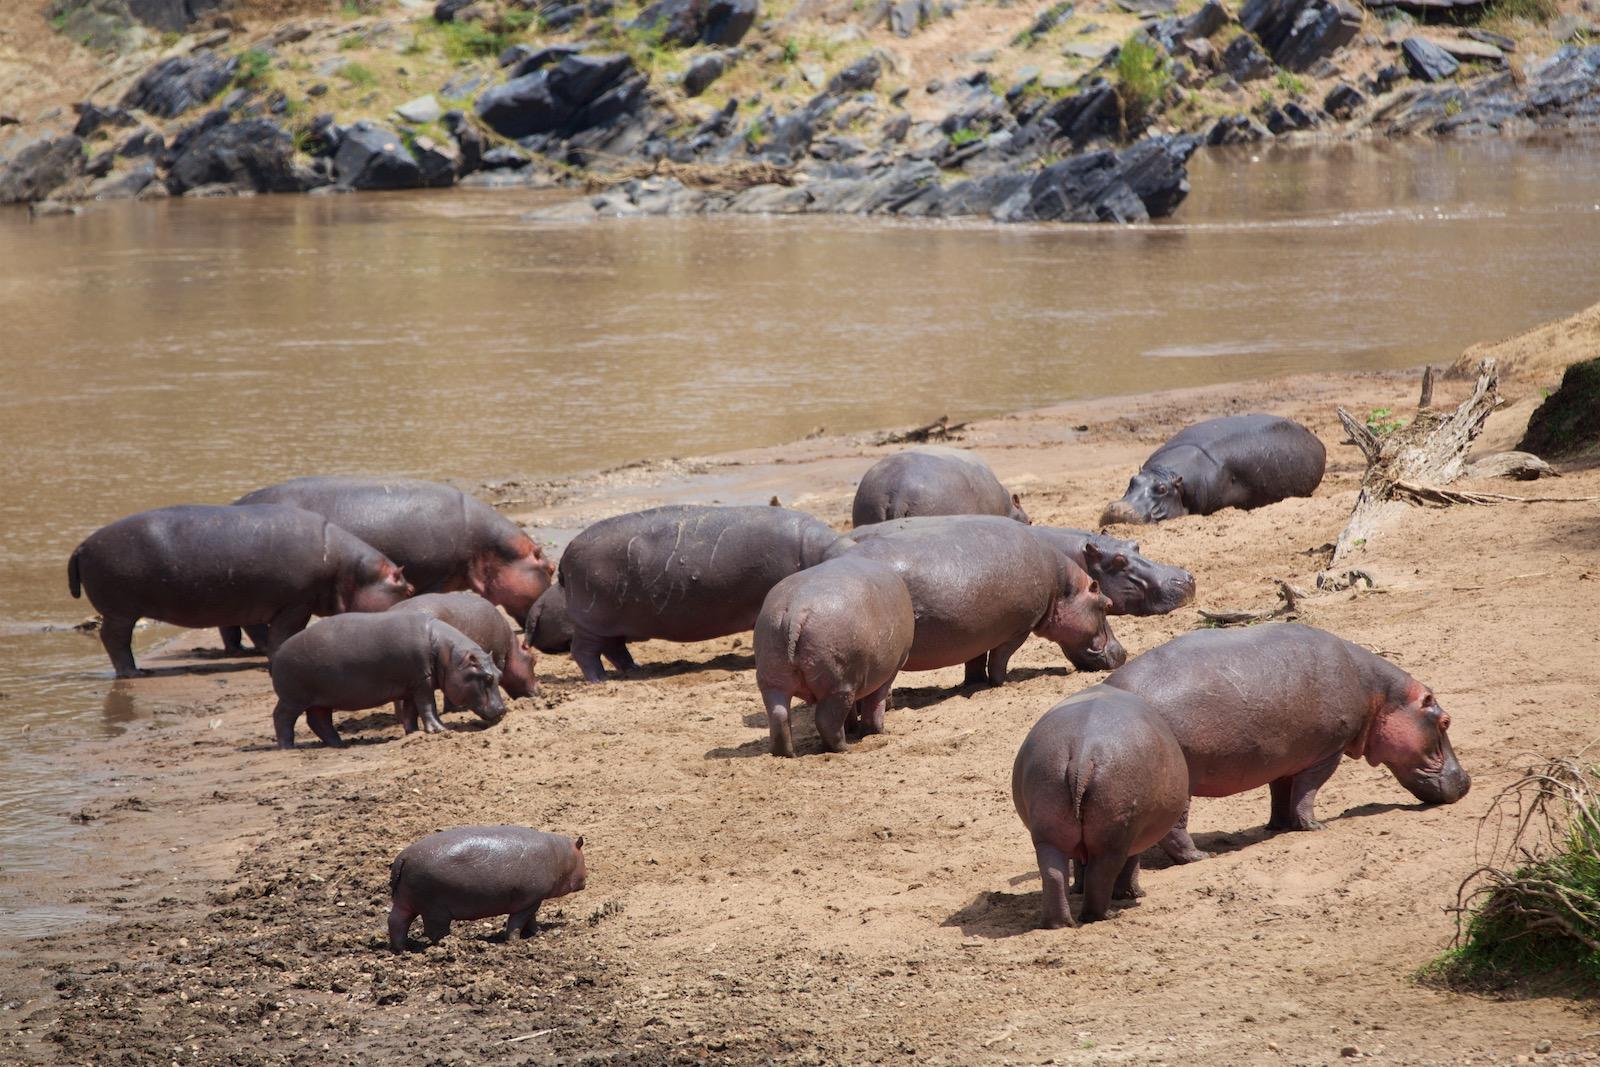 Flodheste Kenya